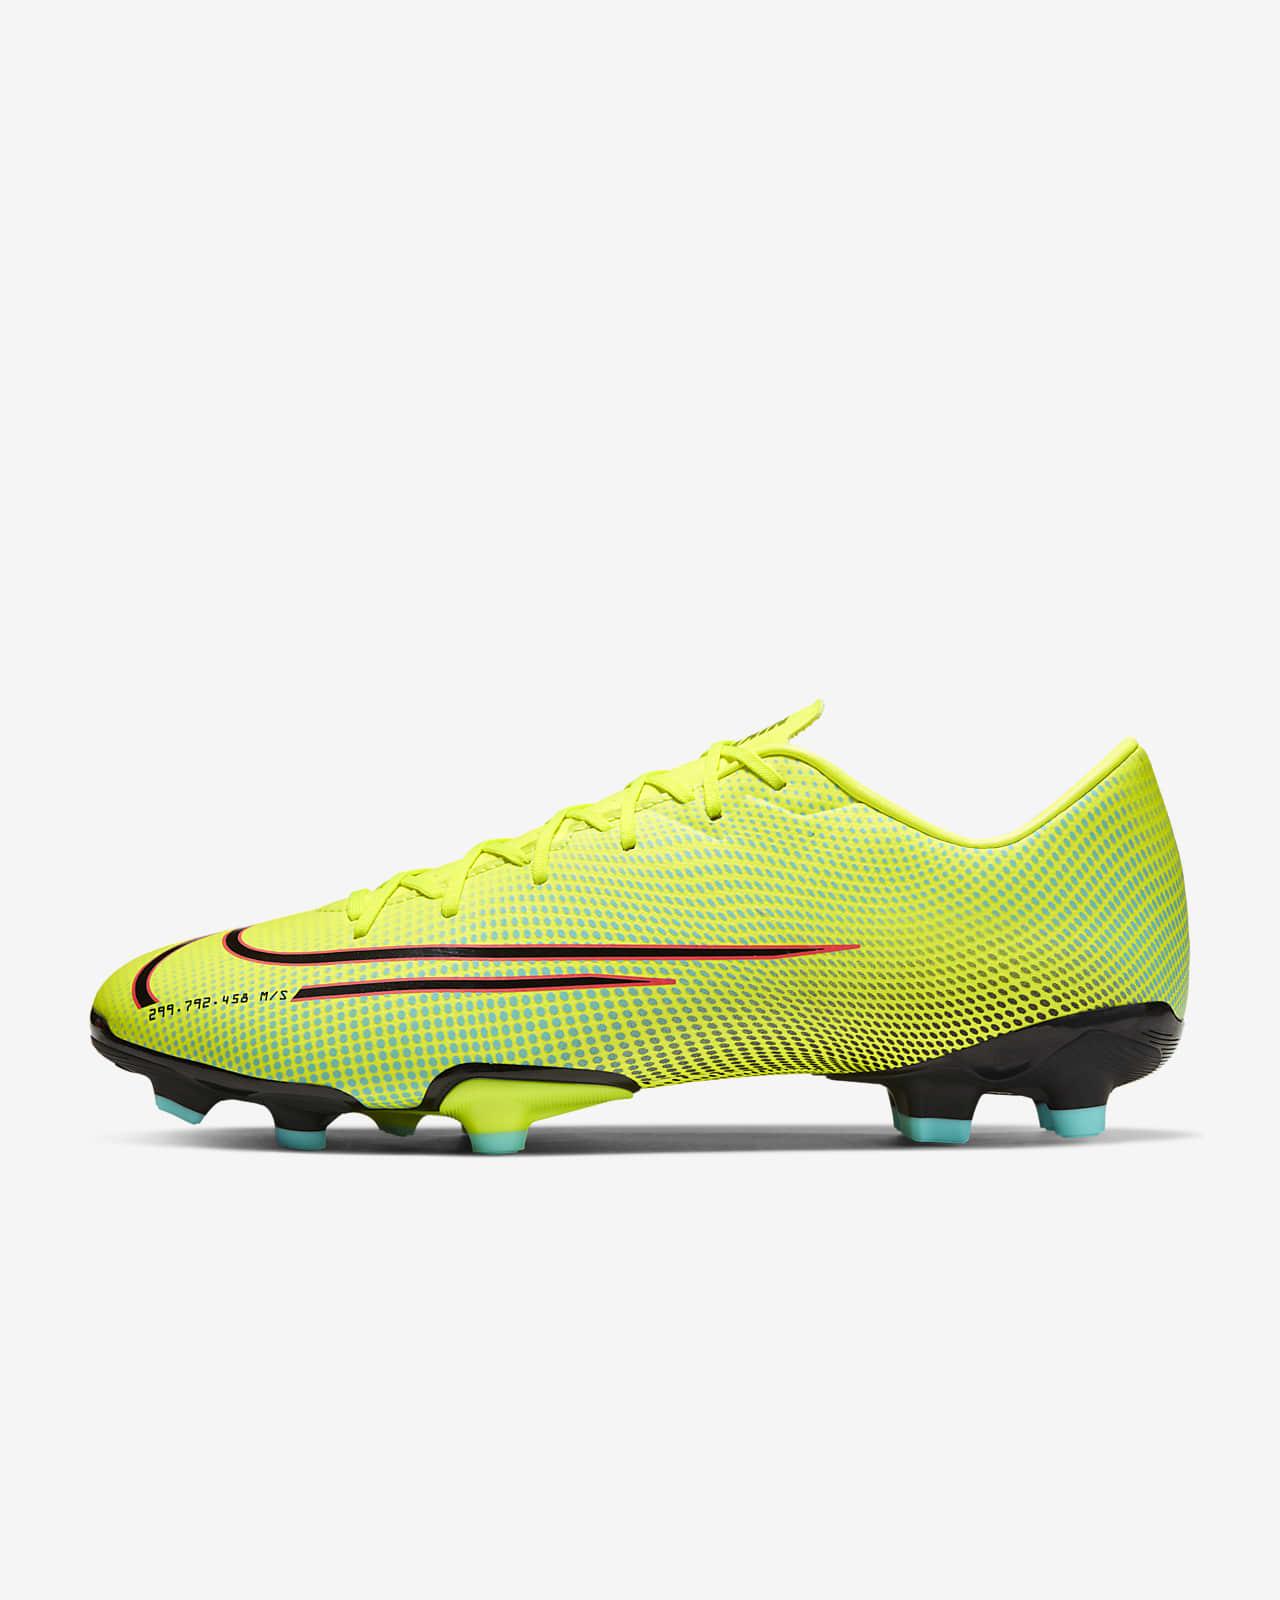 Nike Mercurial Vapor 13 Academy MDS MG Multi-Ground Football Boot